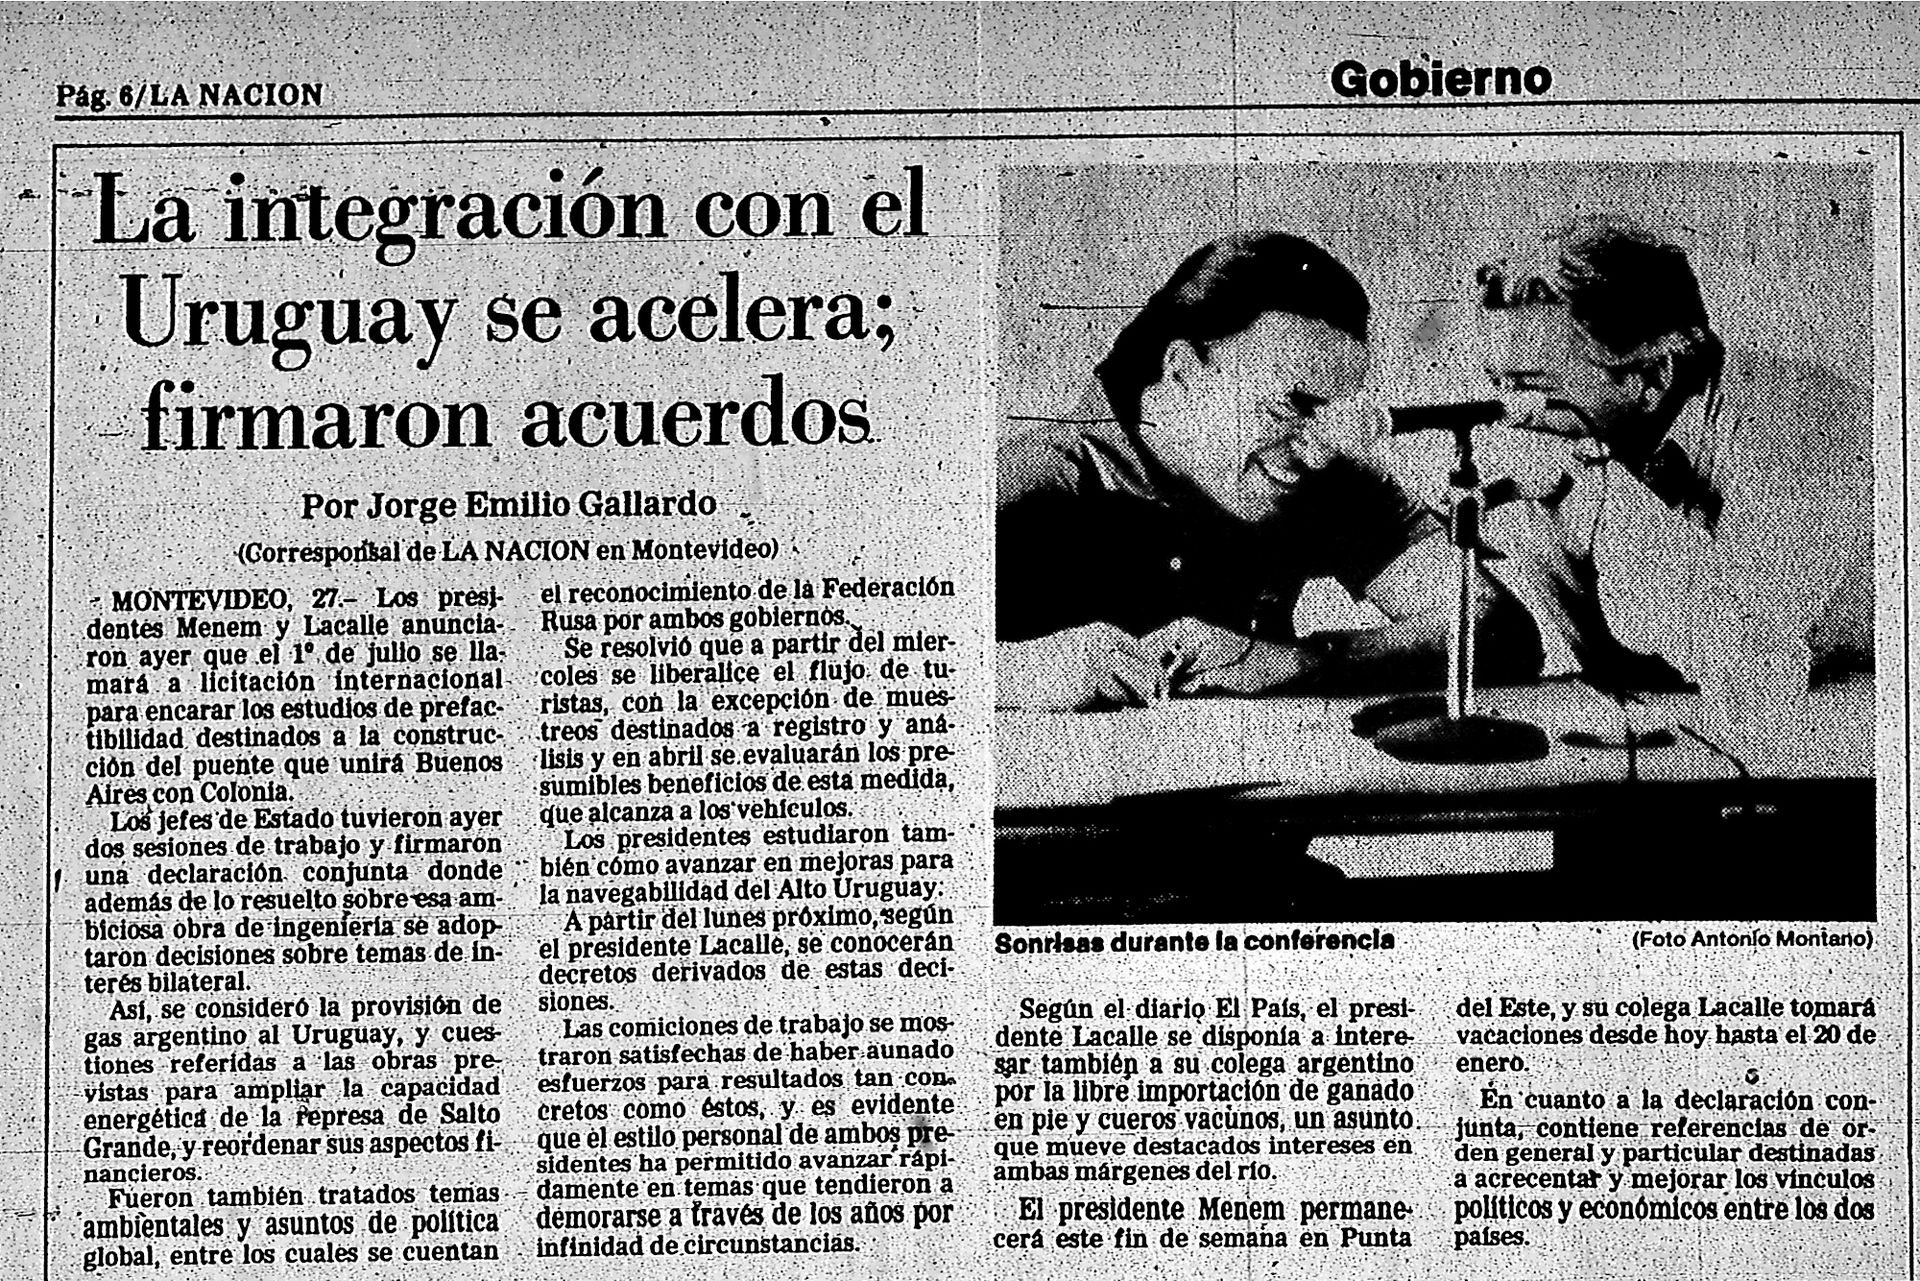 Nota publicada en LA NACION del 28 de diciembre de 1988